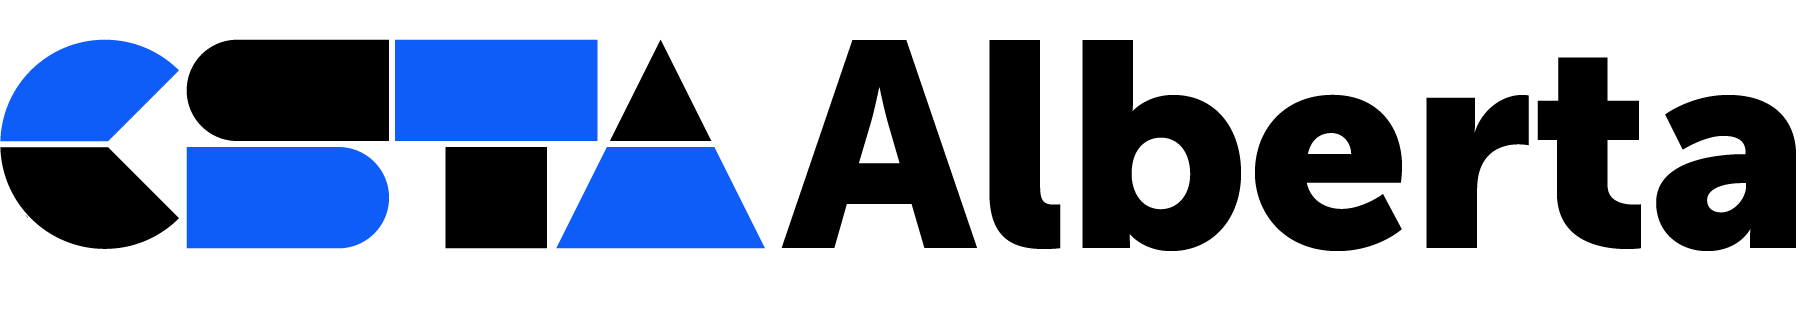 CSTA Alberta logo